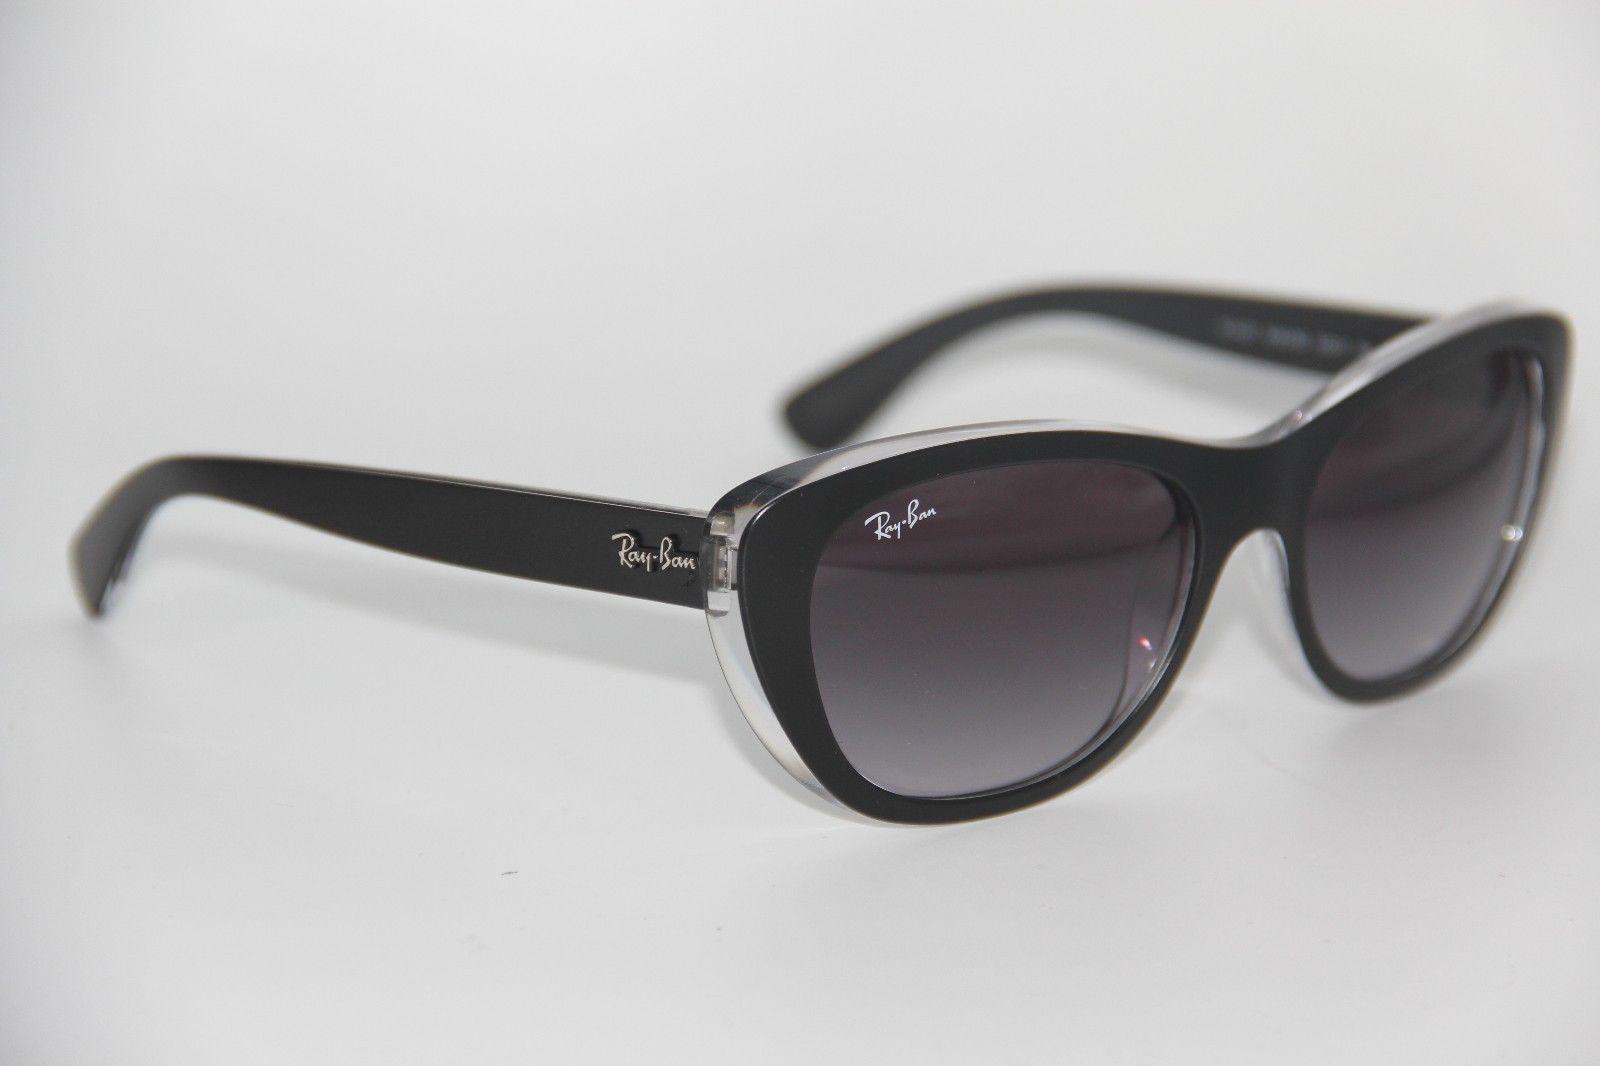 4bce2c76e33 Ray Ban Sunglasses Rb 4227 6052 8 G Black and 50 similar items. 57